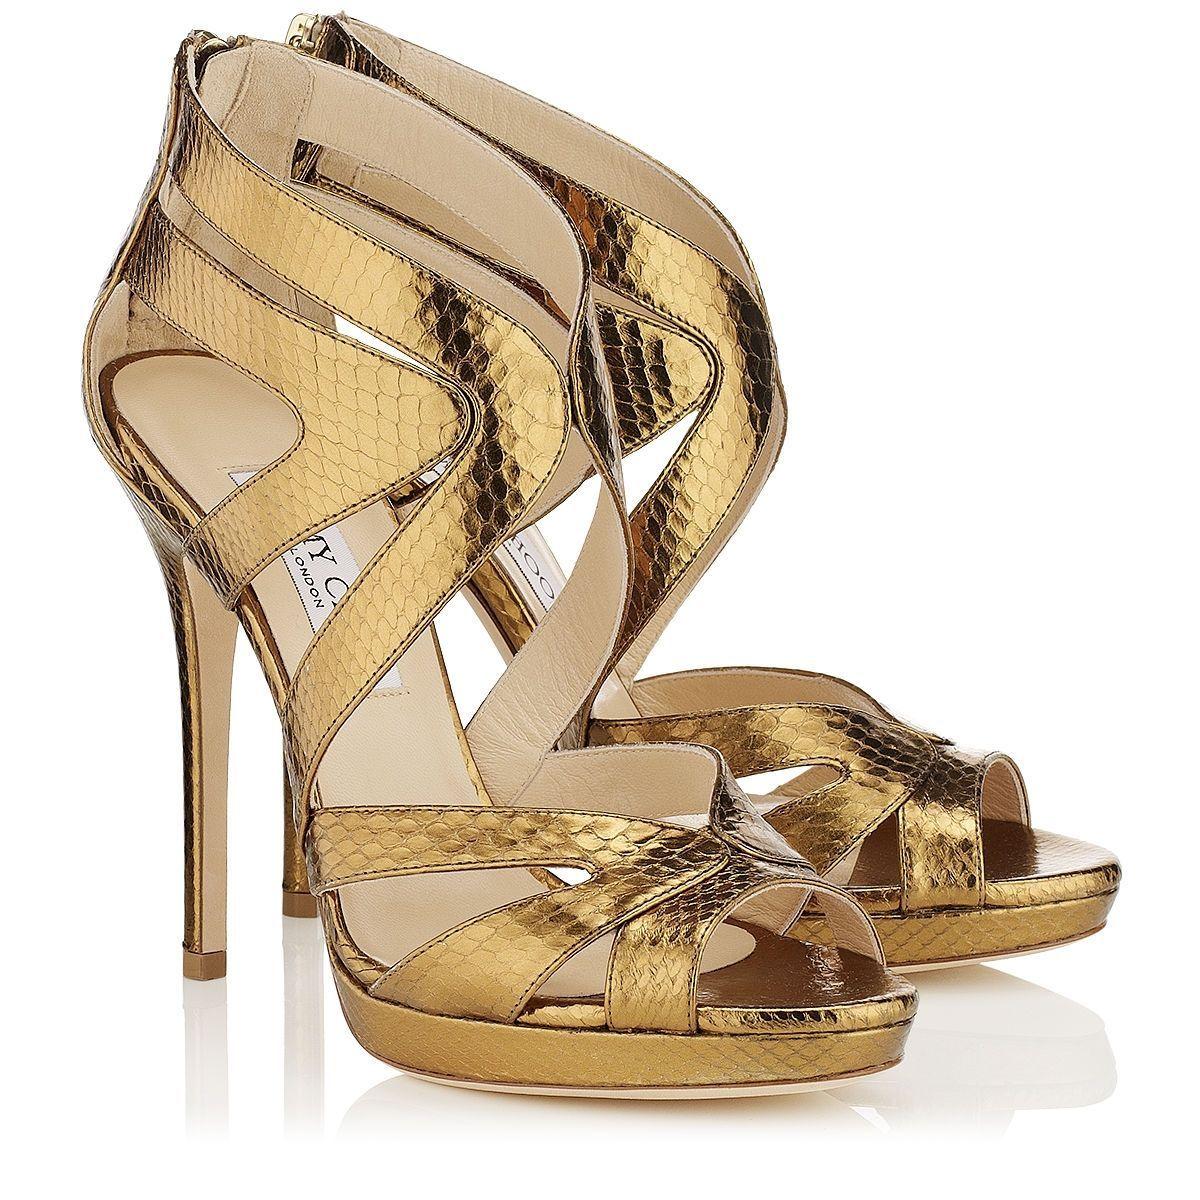 559e9e4c1c1 Jimmy Choo - Collar - 141collarmwa - Bilberry Watersnake Platform Sandals